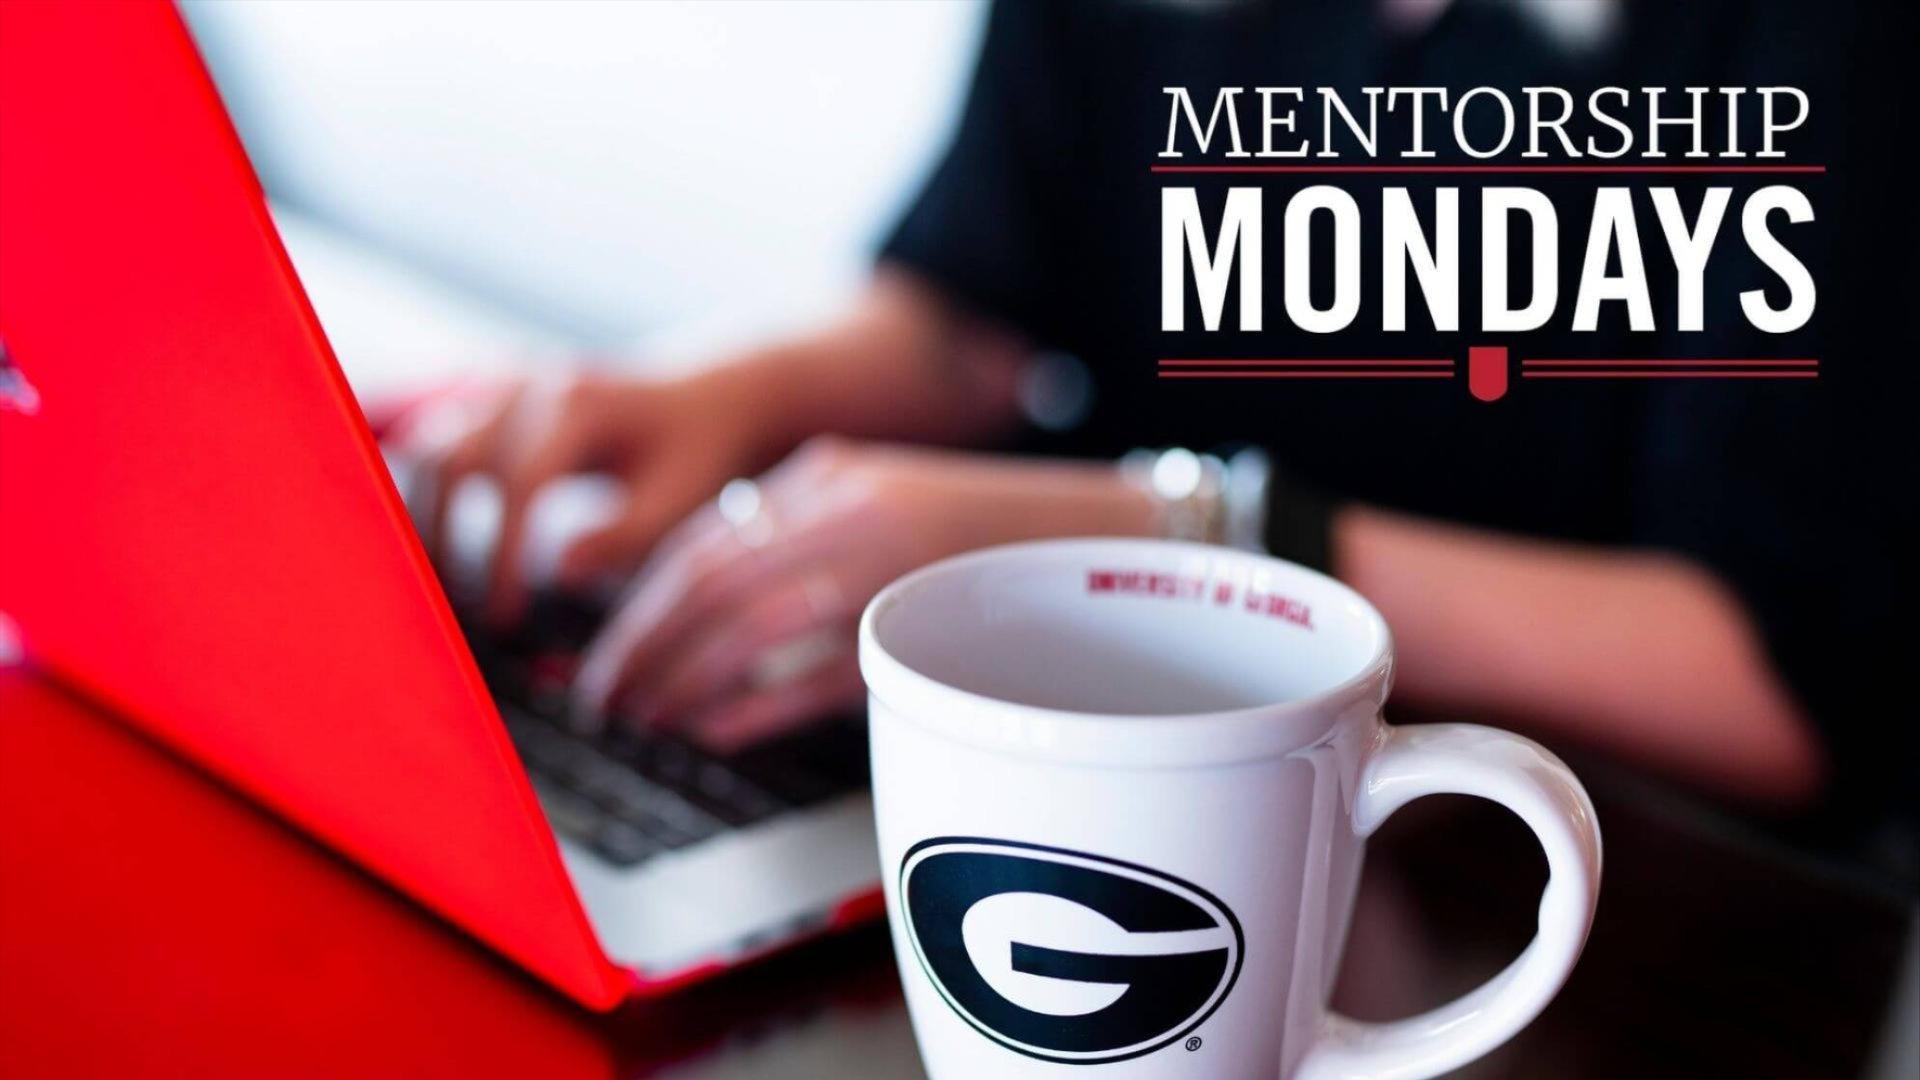 Join us for Mentorship Monday on September 20